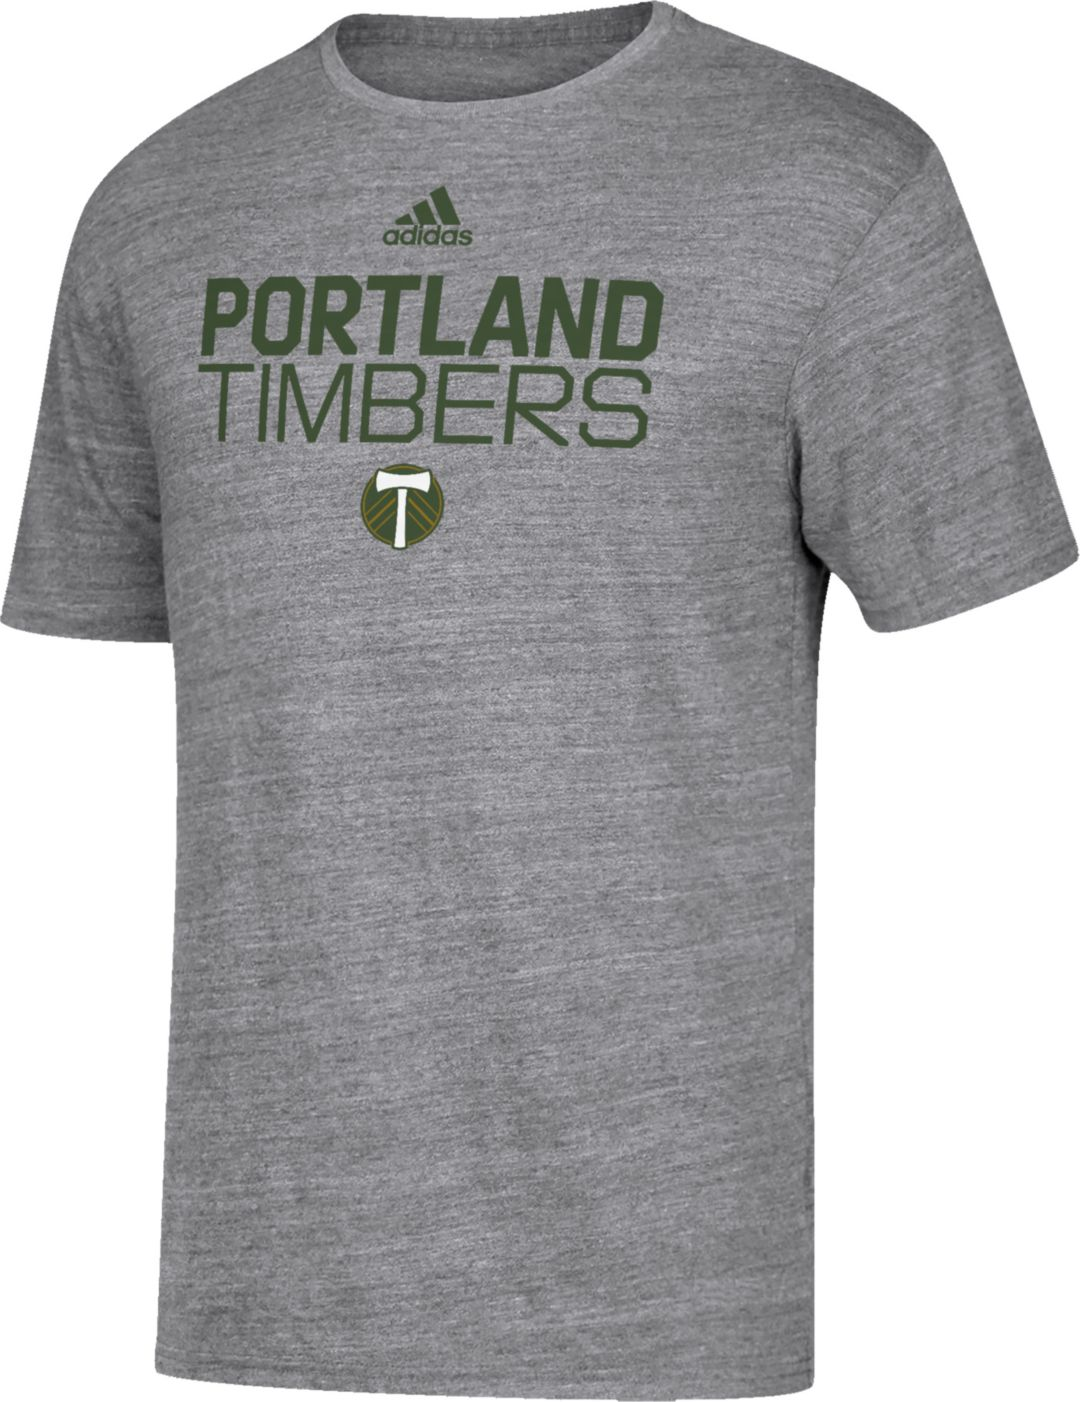 low priced 186a2 5e251 adidas Men's Portland Timbers Locker Heather Grey Tri-Blend T-Shirt